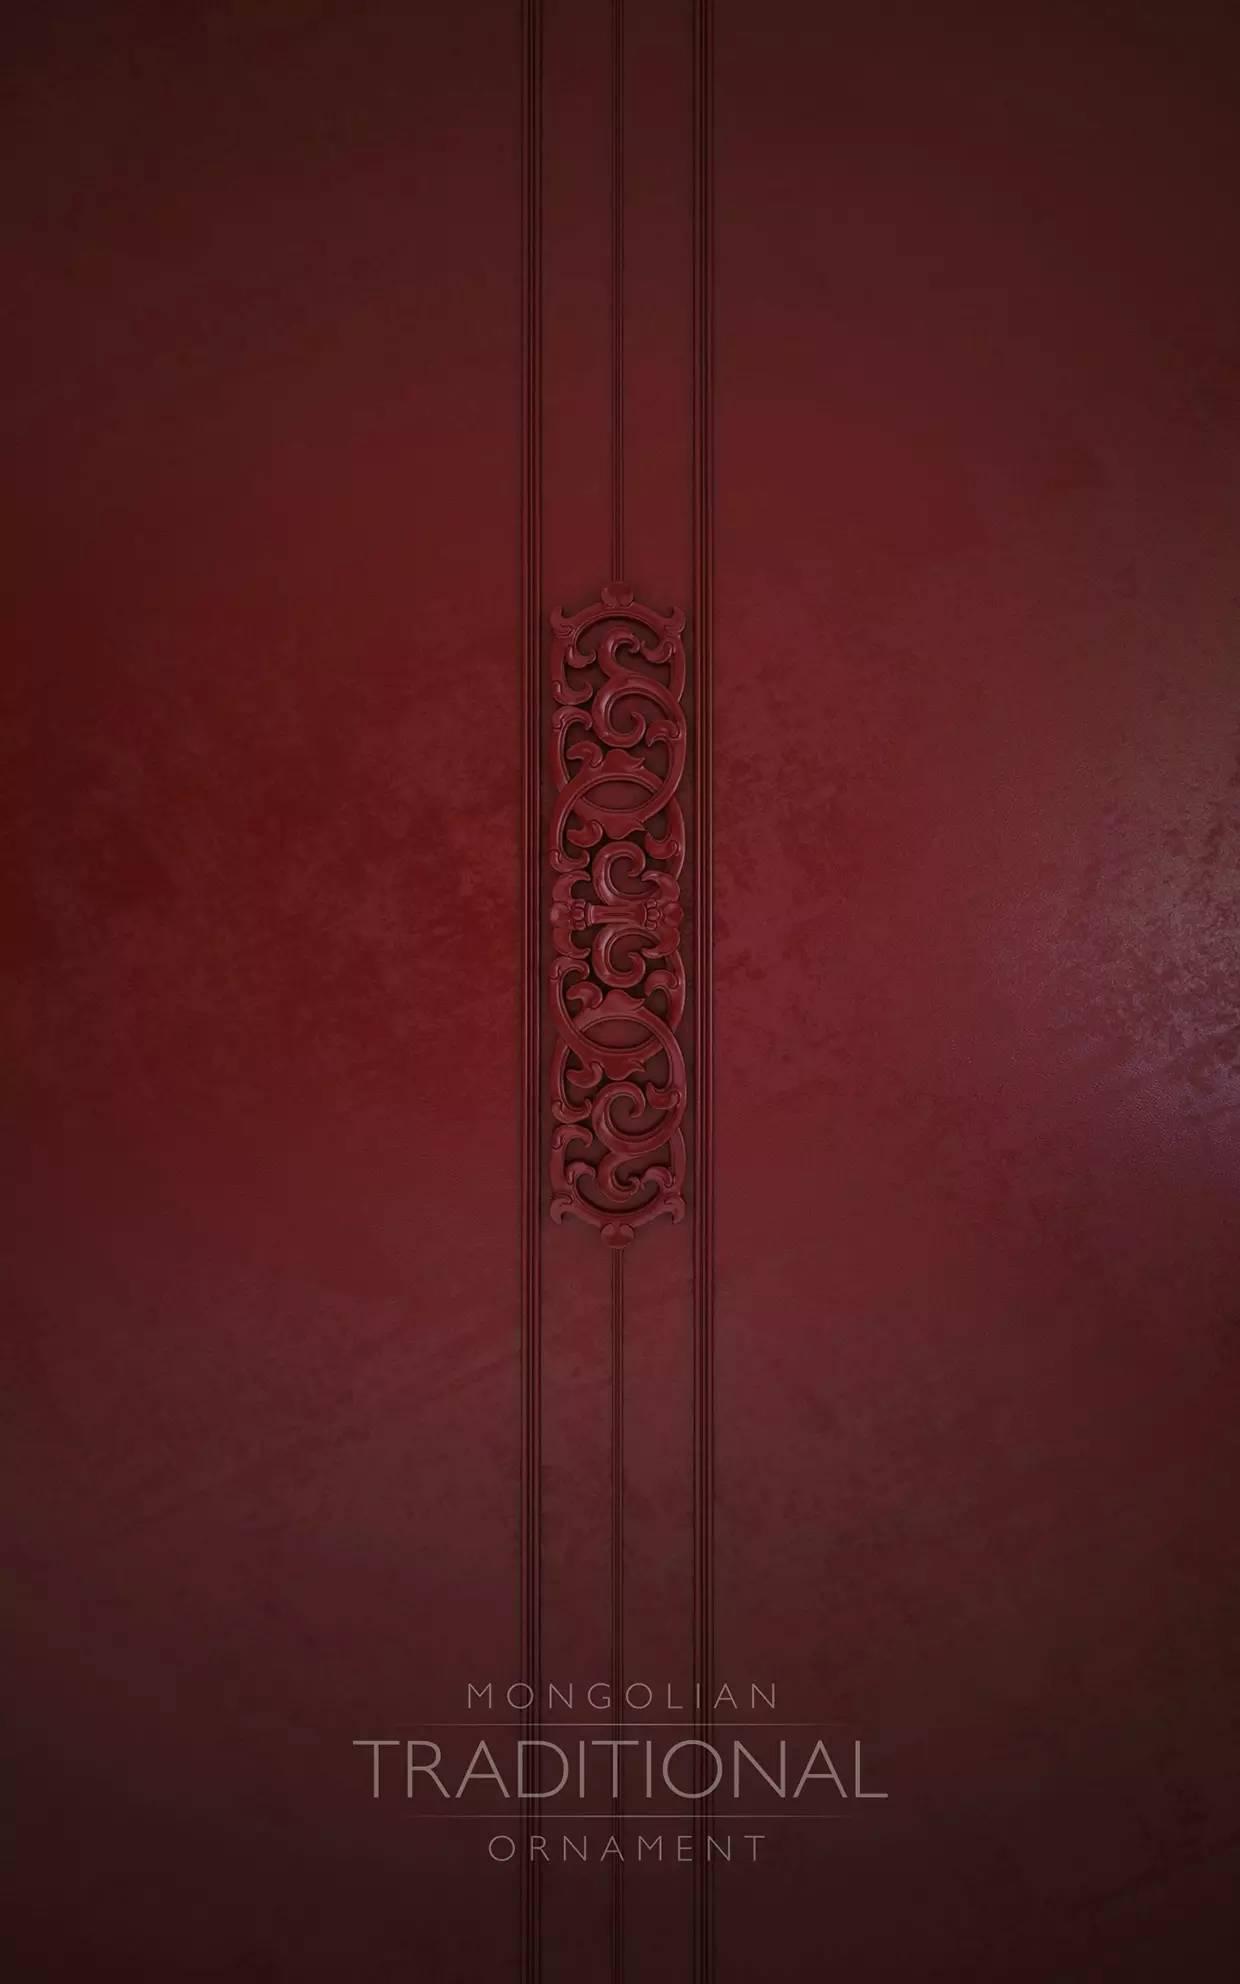 室内设计|蒙族传统装饰(Mongolian Traditional Ornament) 第2张